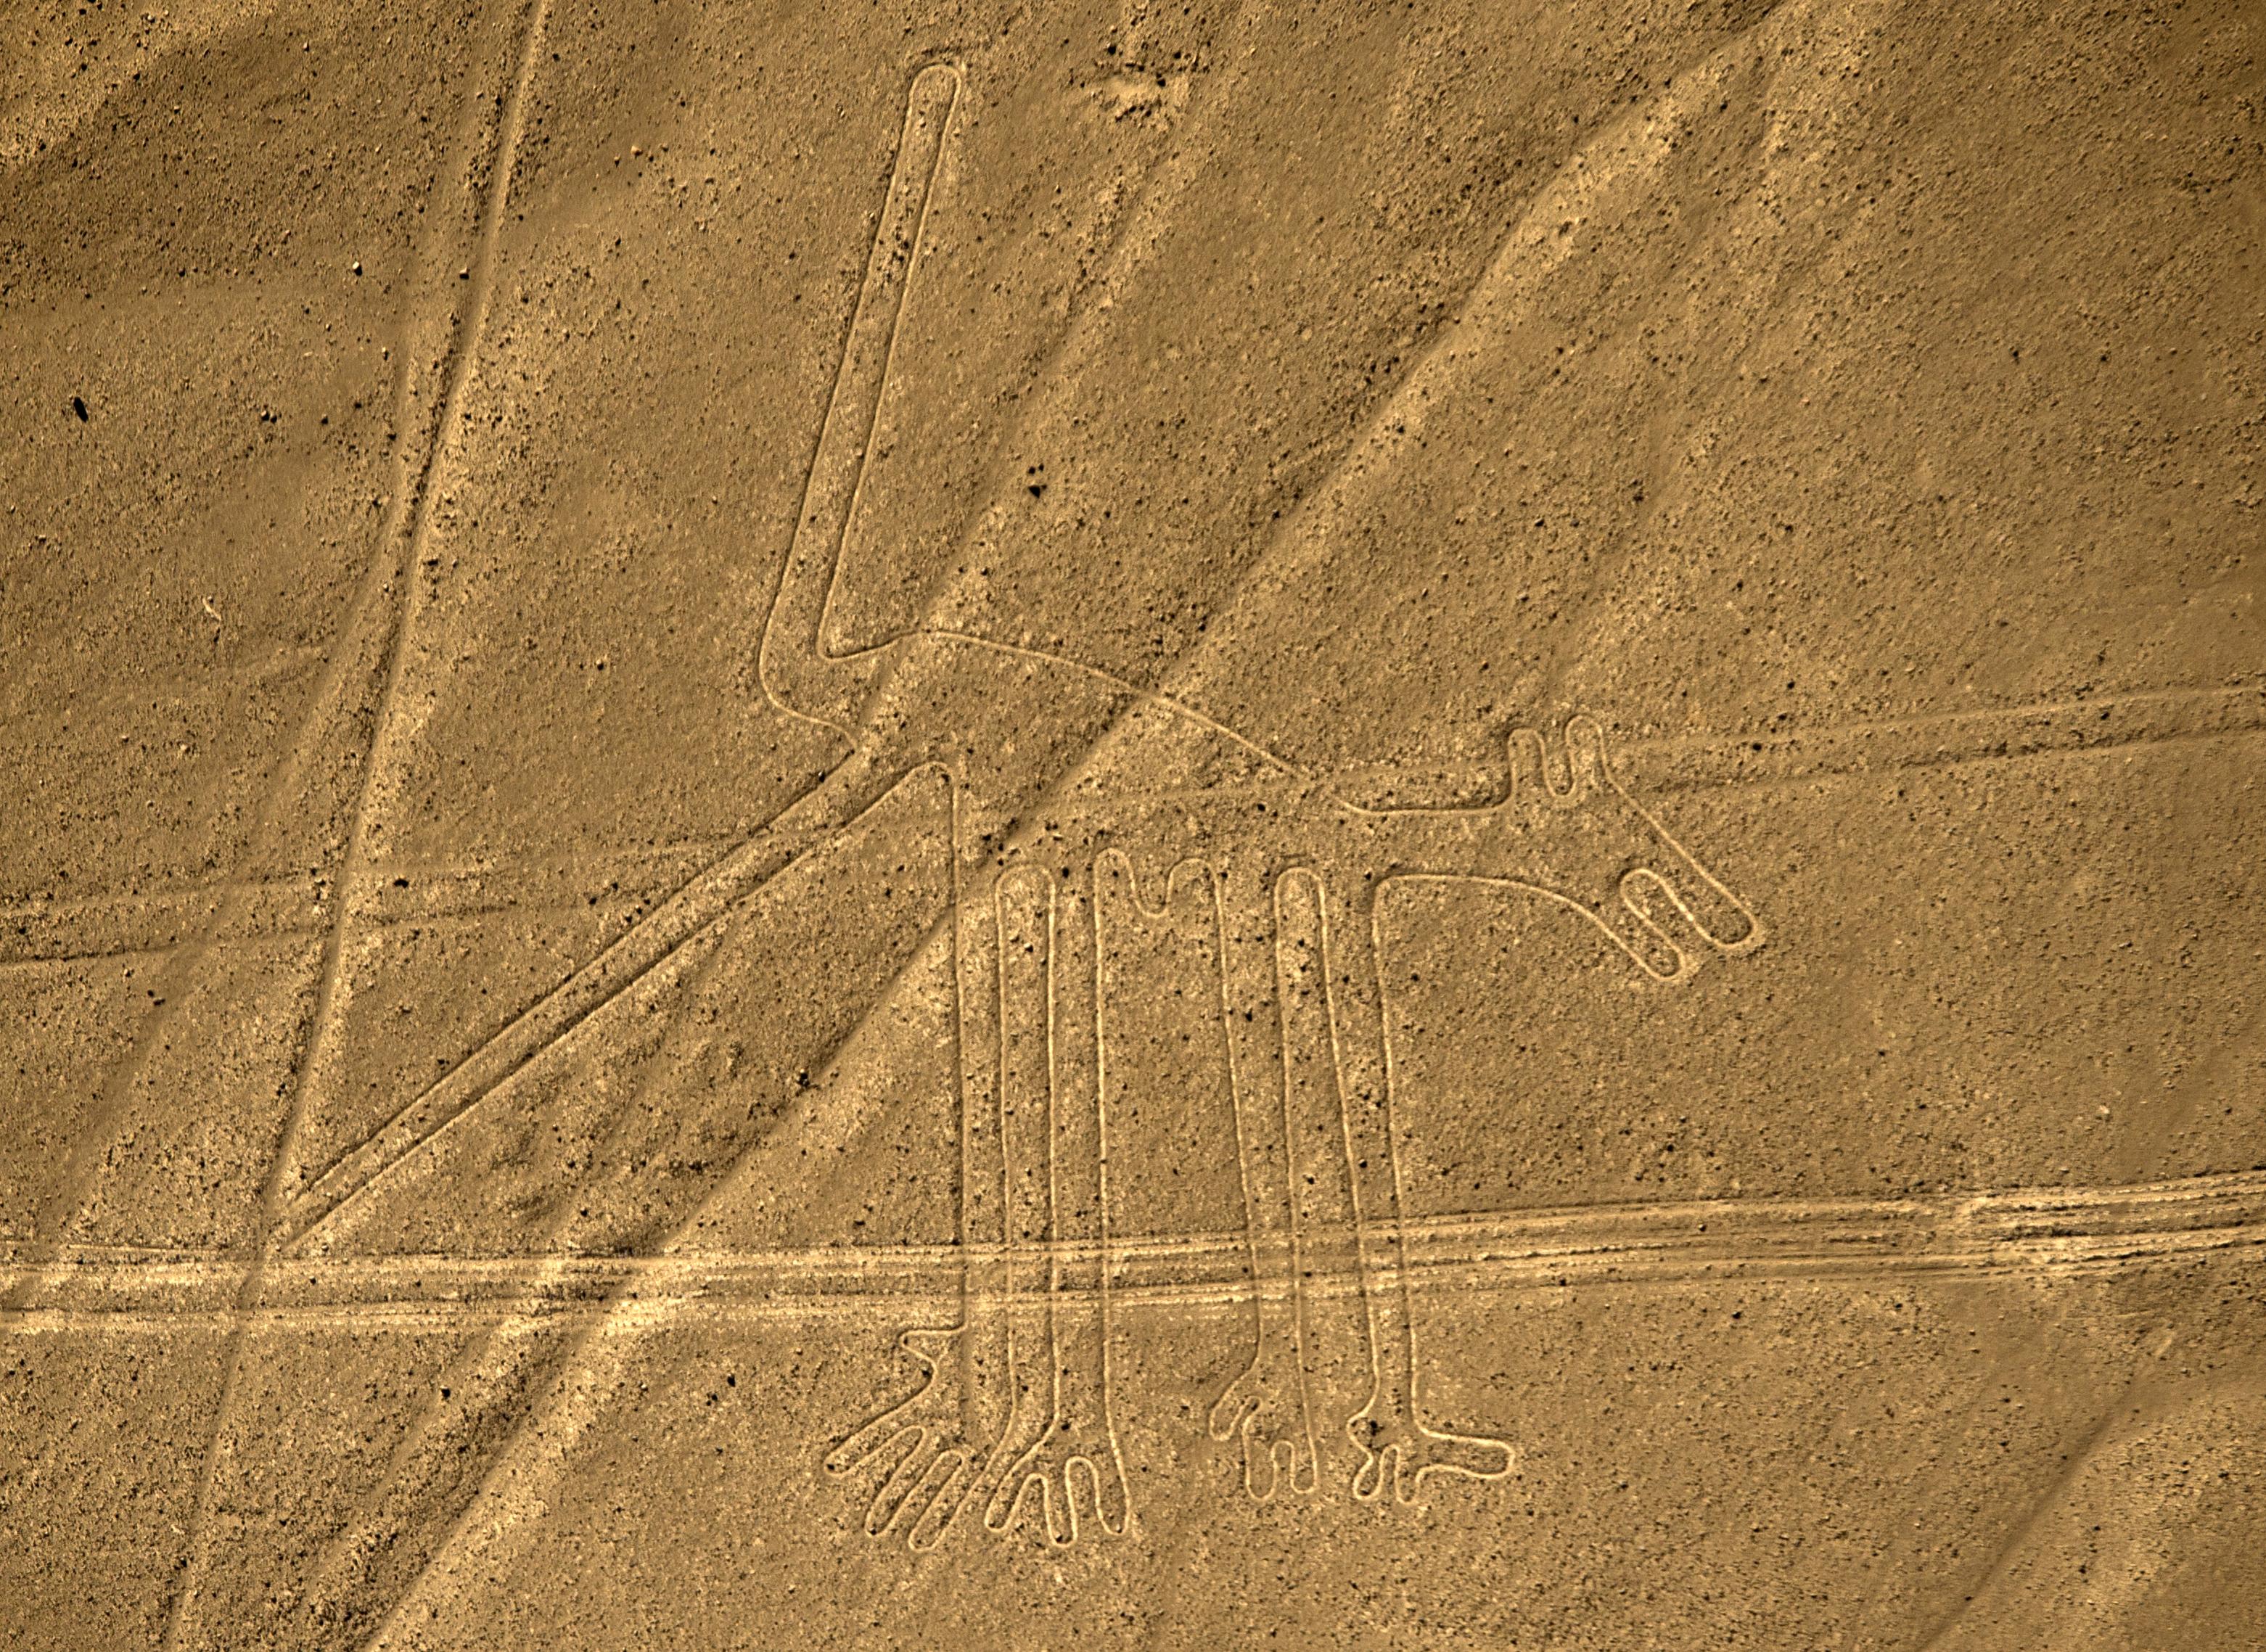 Imagen de las líneas de Nazca de 2014 | Martín Bernetti | Agence France-Presse